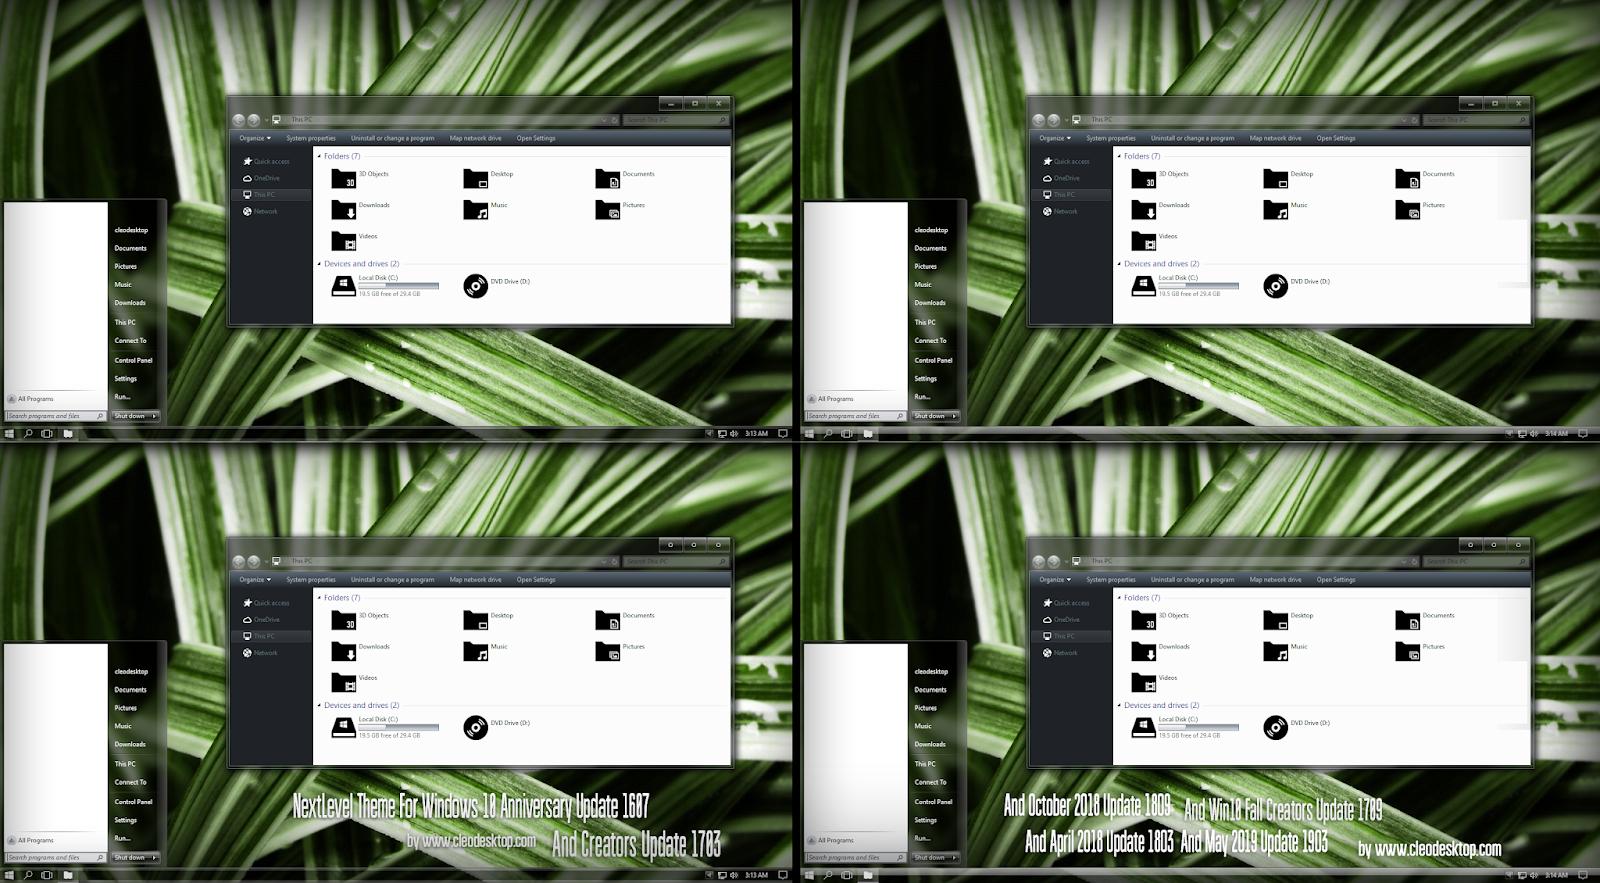 NEXTlevel Glass Theme Windows10 May 2019 Update 1903